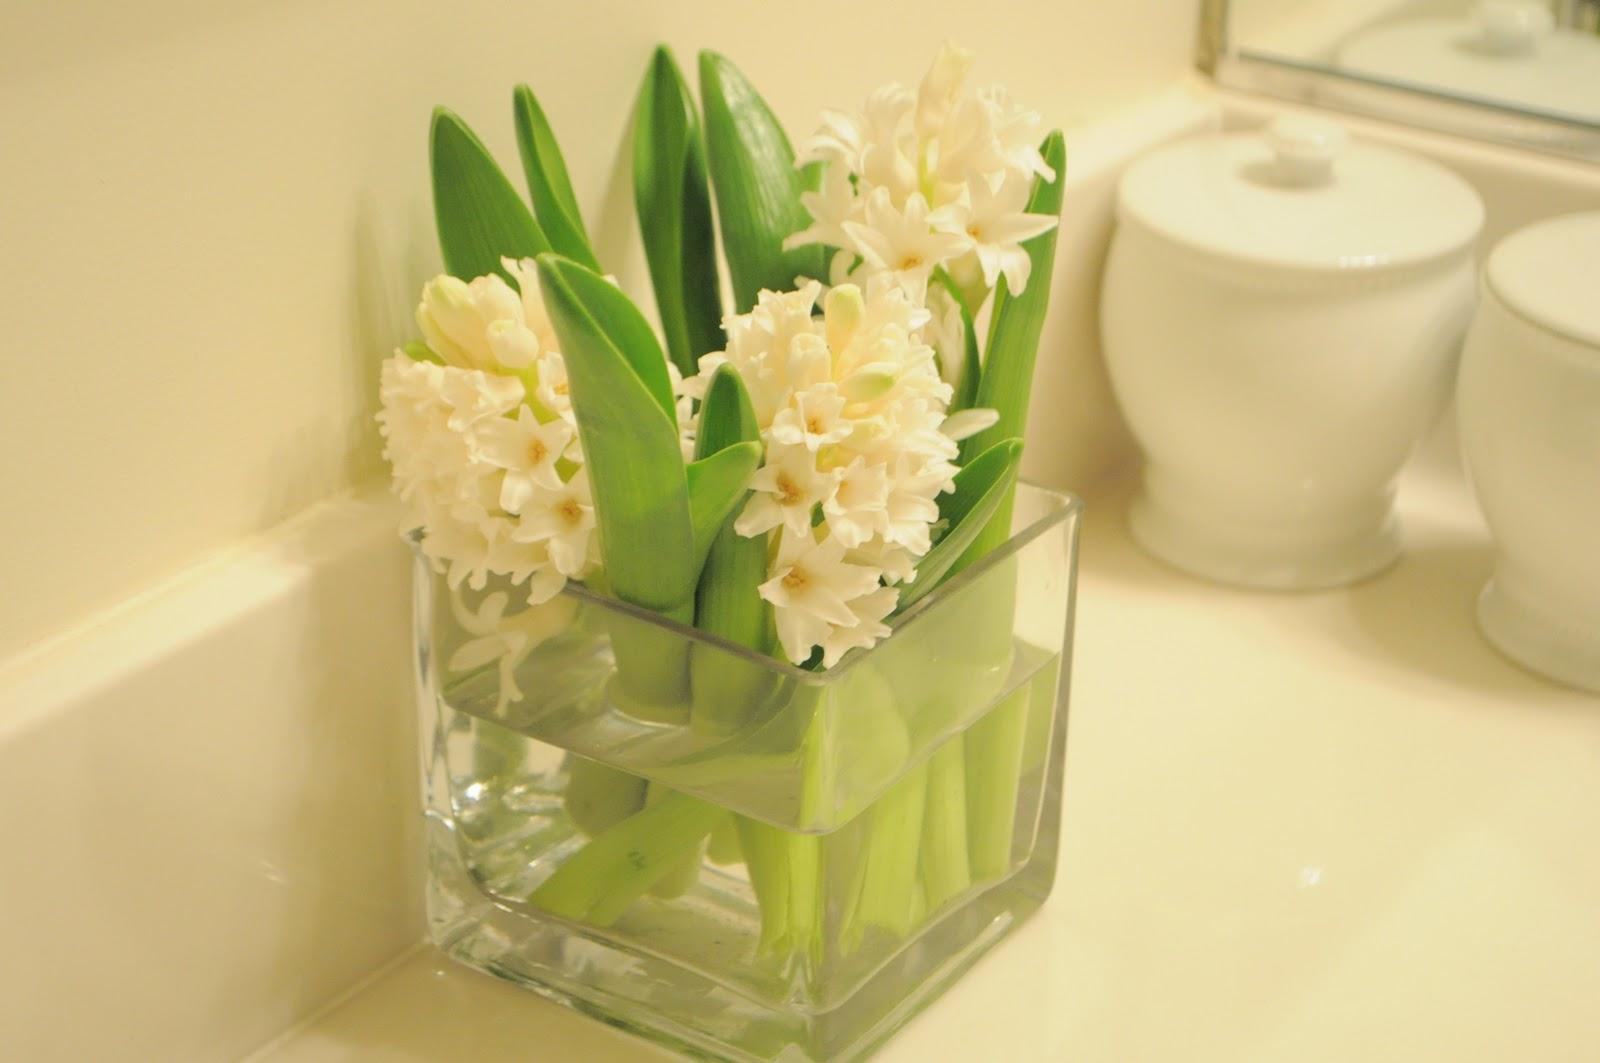 Bathroom flower decor - Fresh Flowers In The Bathroom